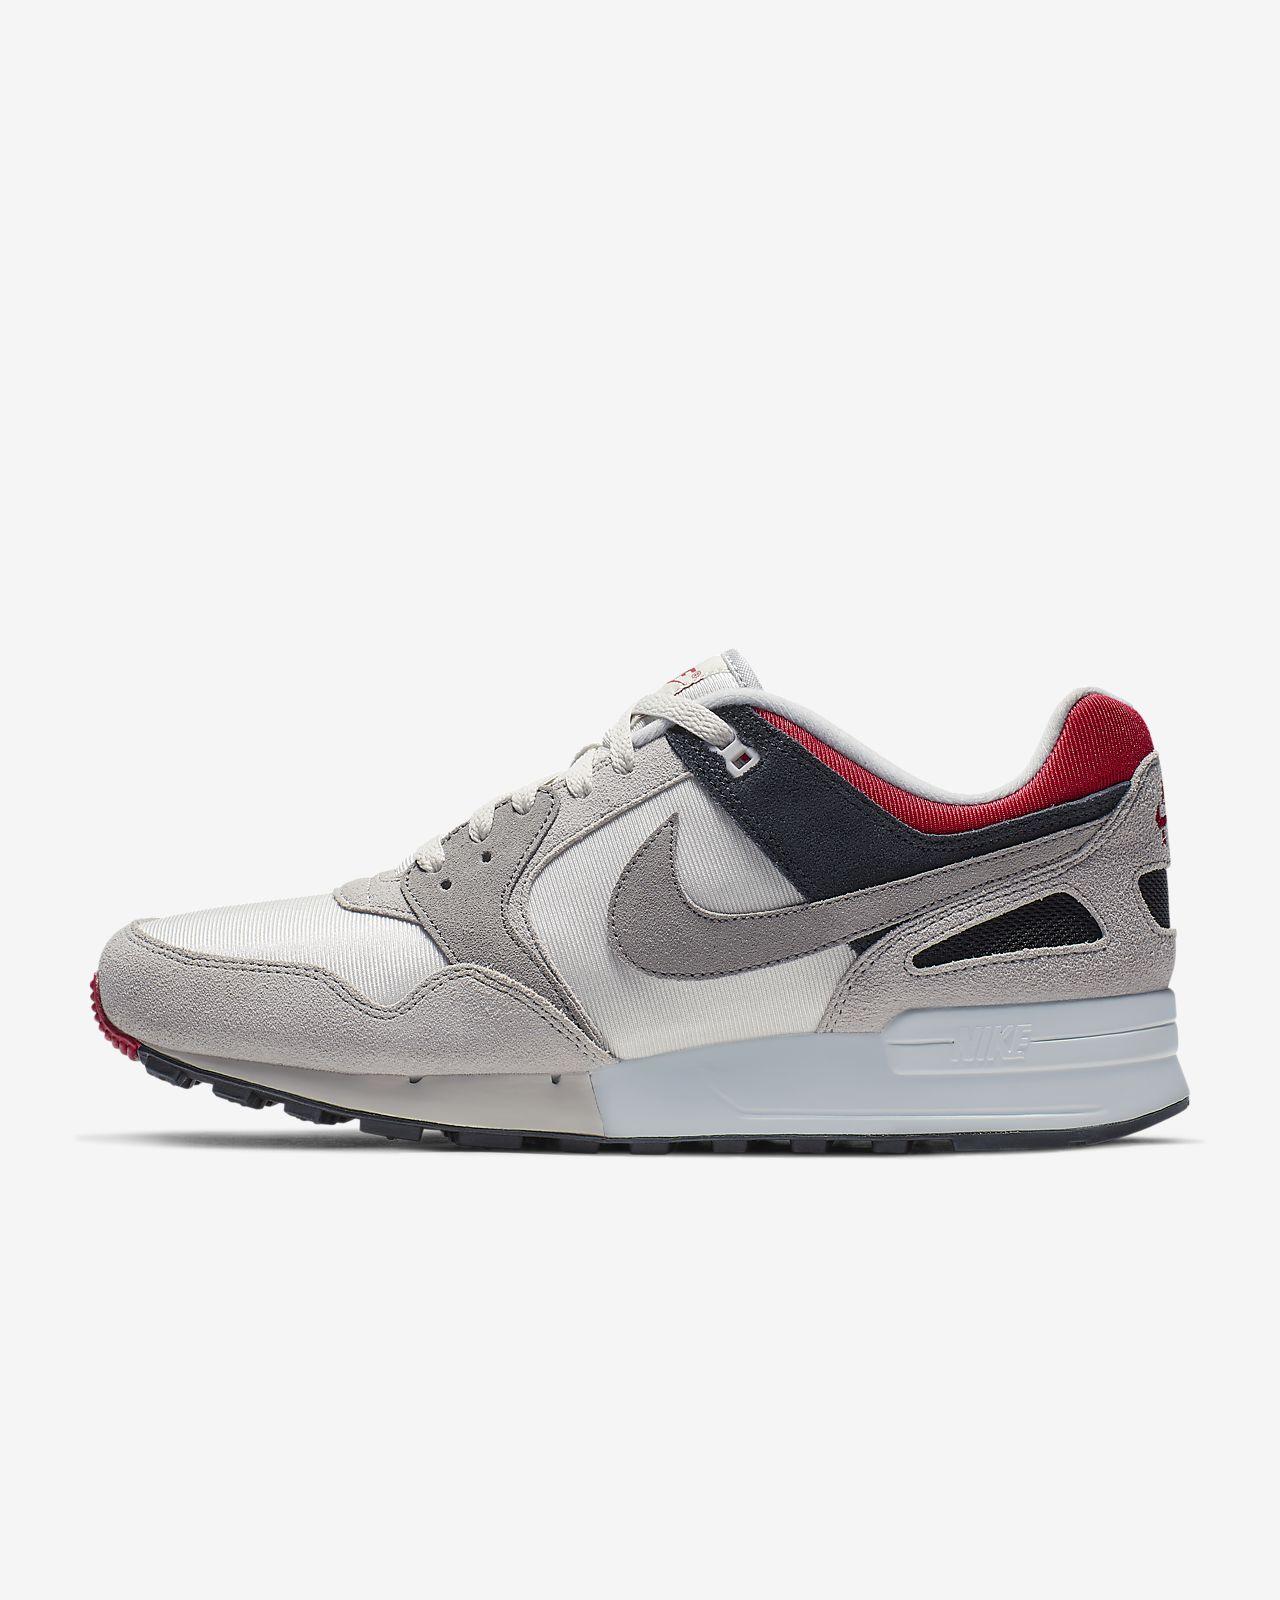 00ccae825ea2 Nike Air Pegasus  89 SE Men s Shoe. Nike.com AU